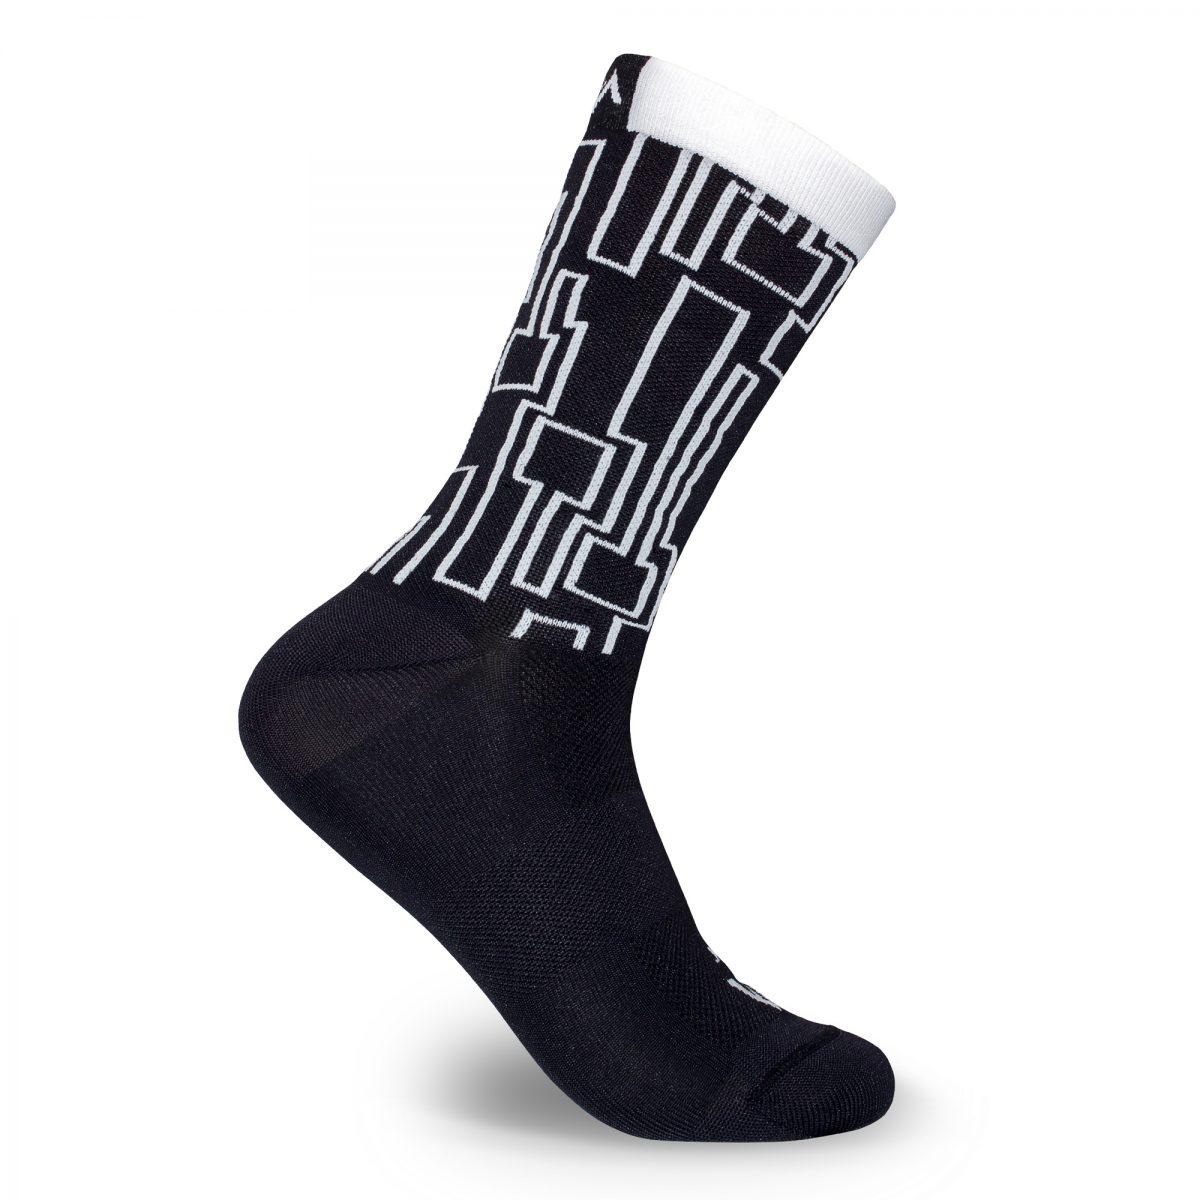 Da Vino Socks